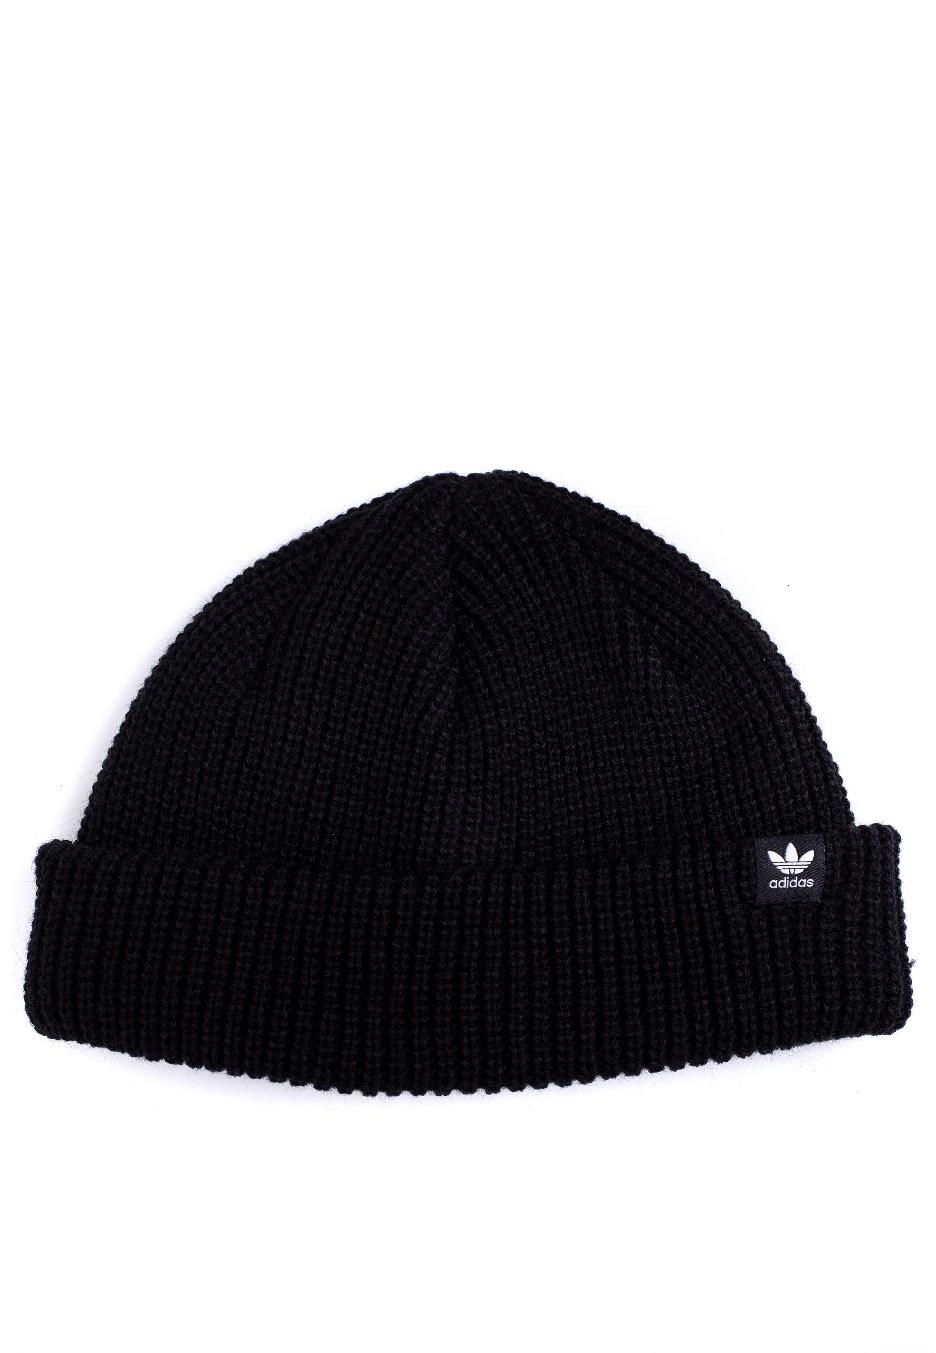 Adidas - Short Black - Beanie - Streetwear Shop - Impericon.com US f252beeeb93